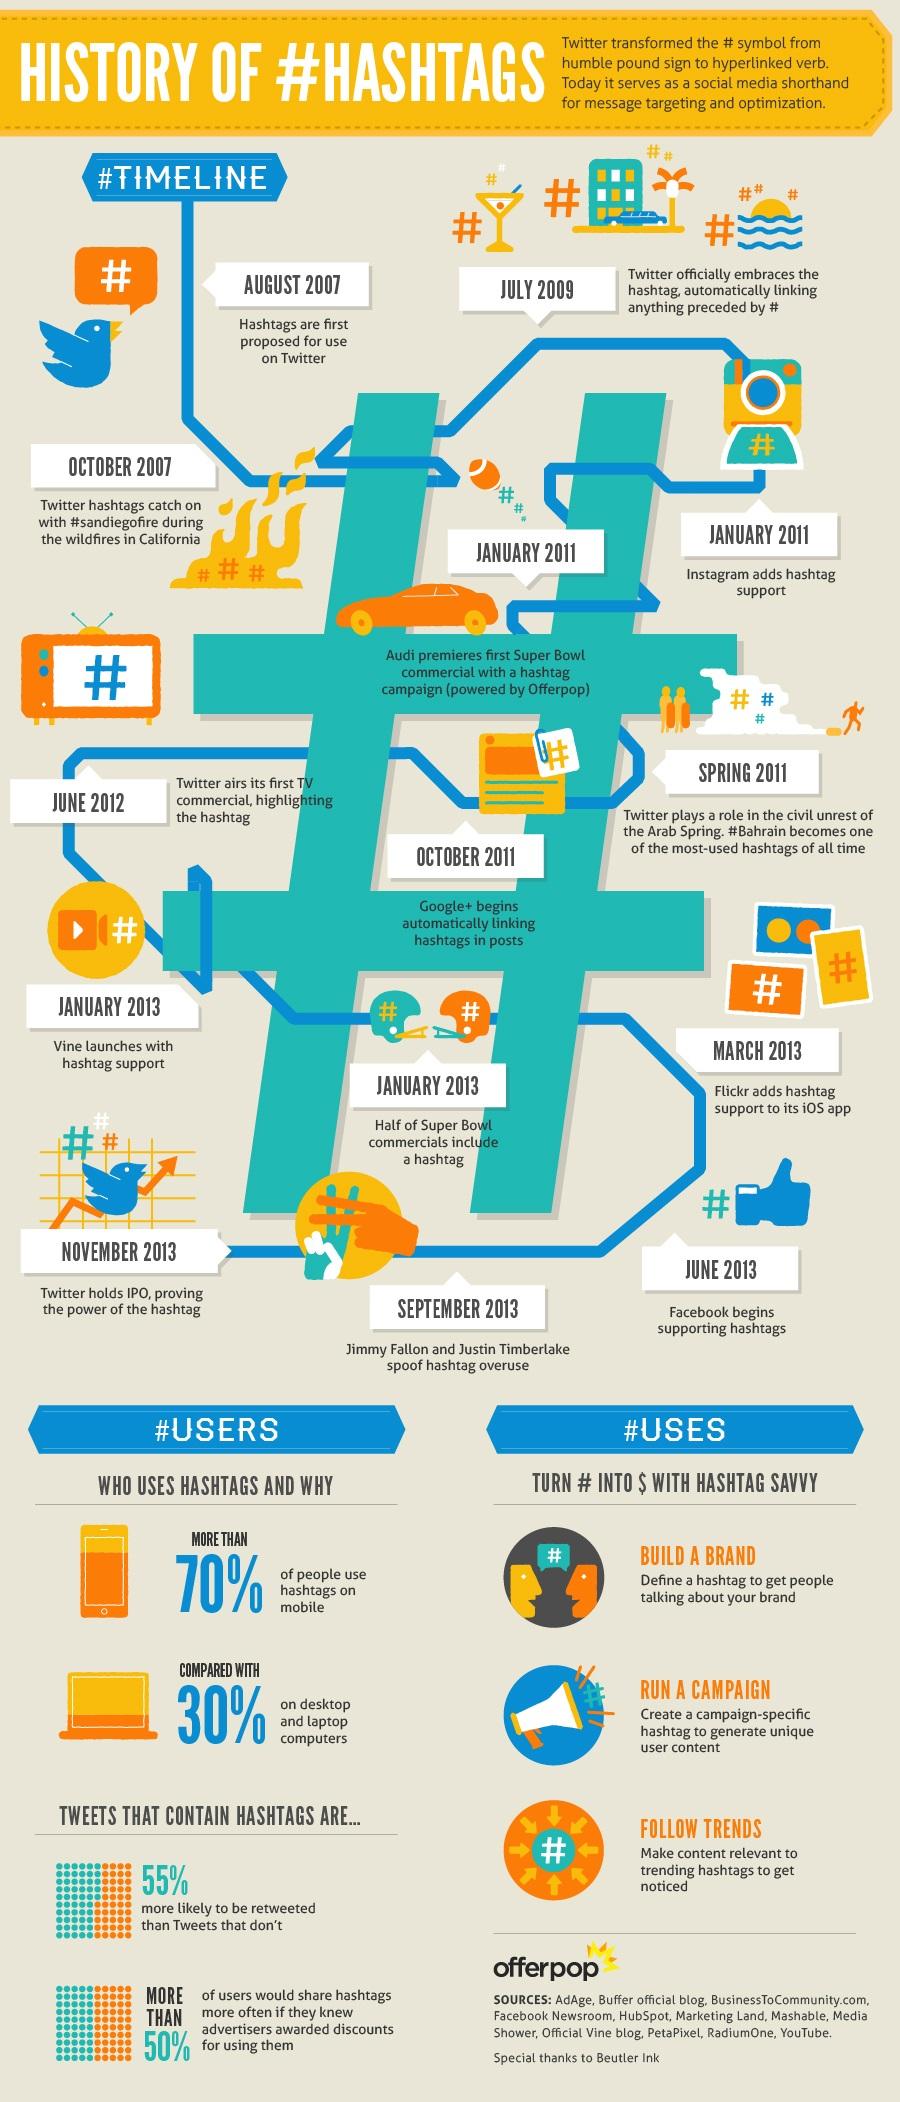 Historia del # Hashtag, averigua las redes sociales que implementaron uso de Hashtags